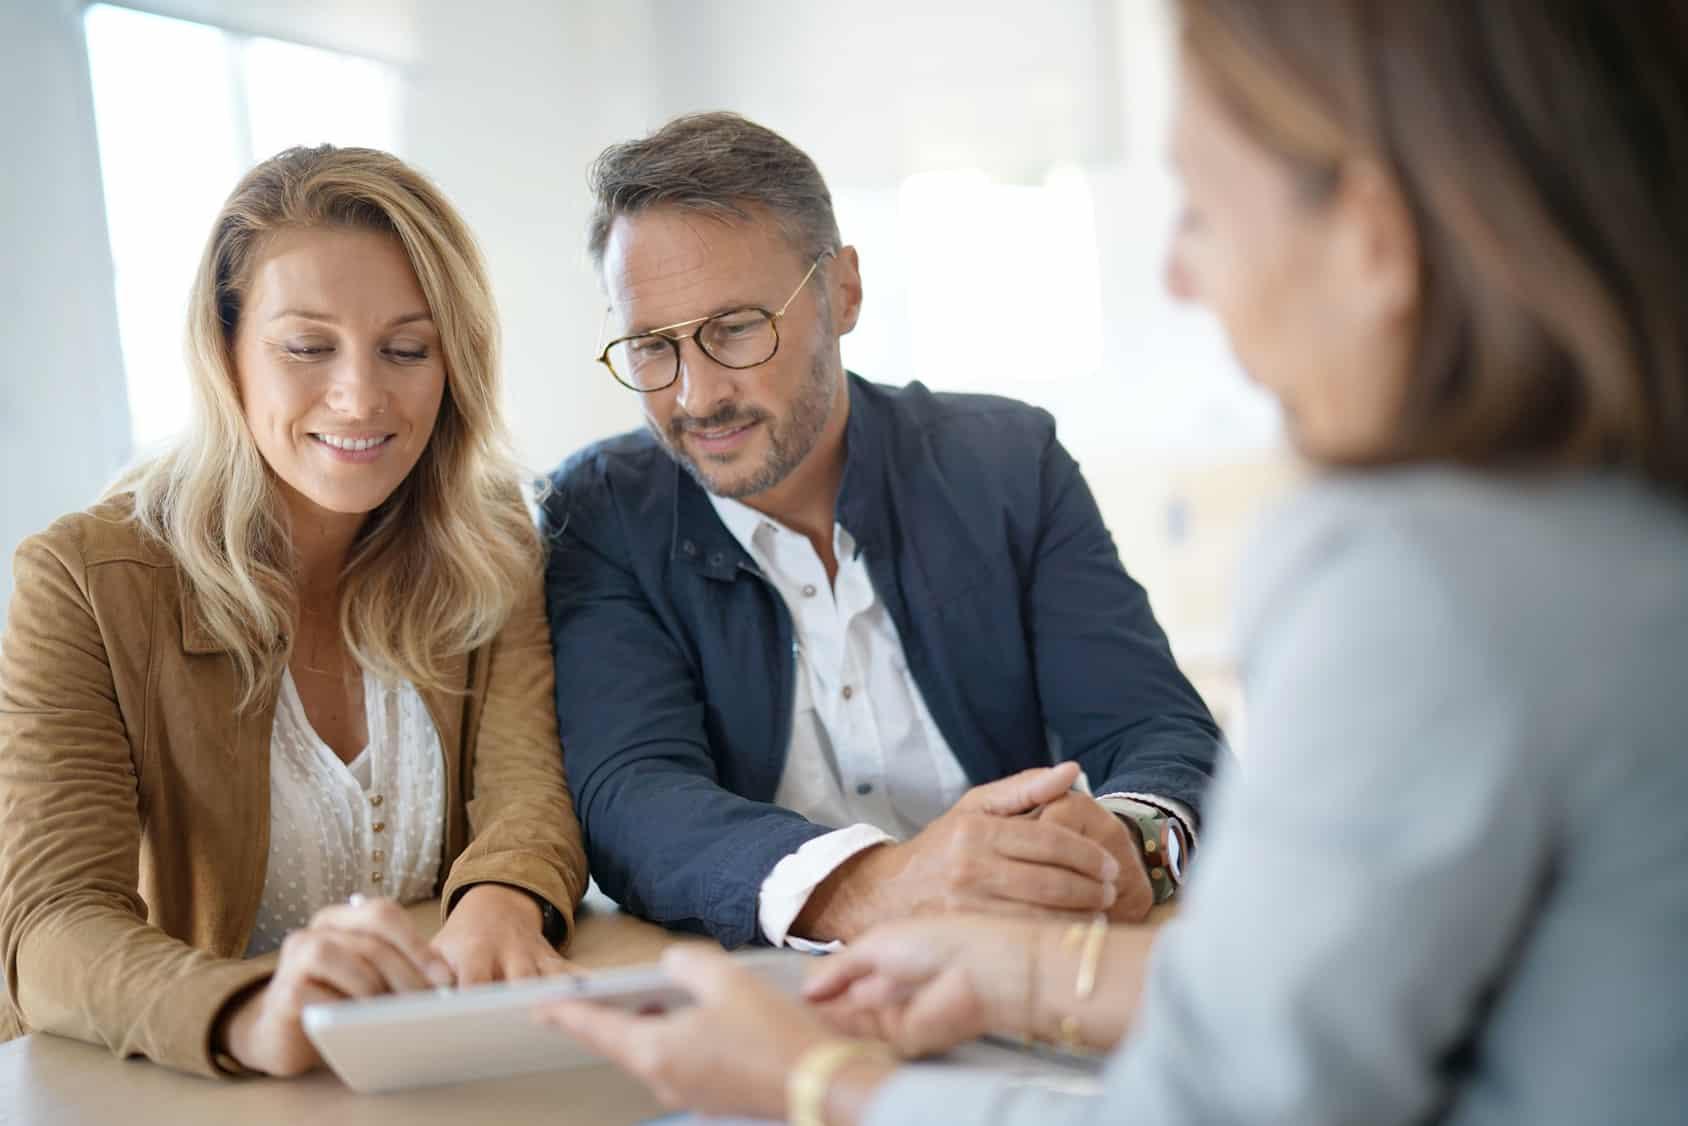 proposition d'assurance emprunteur